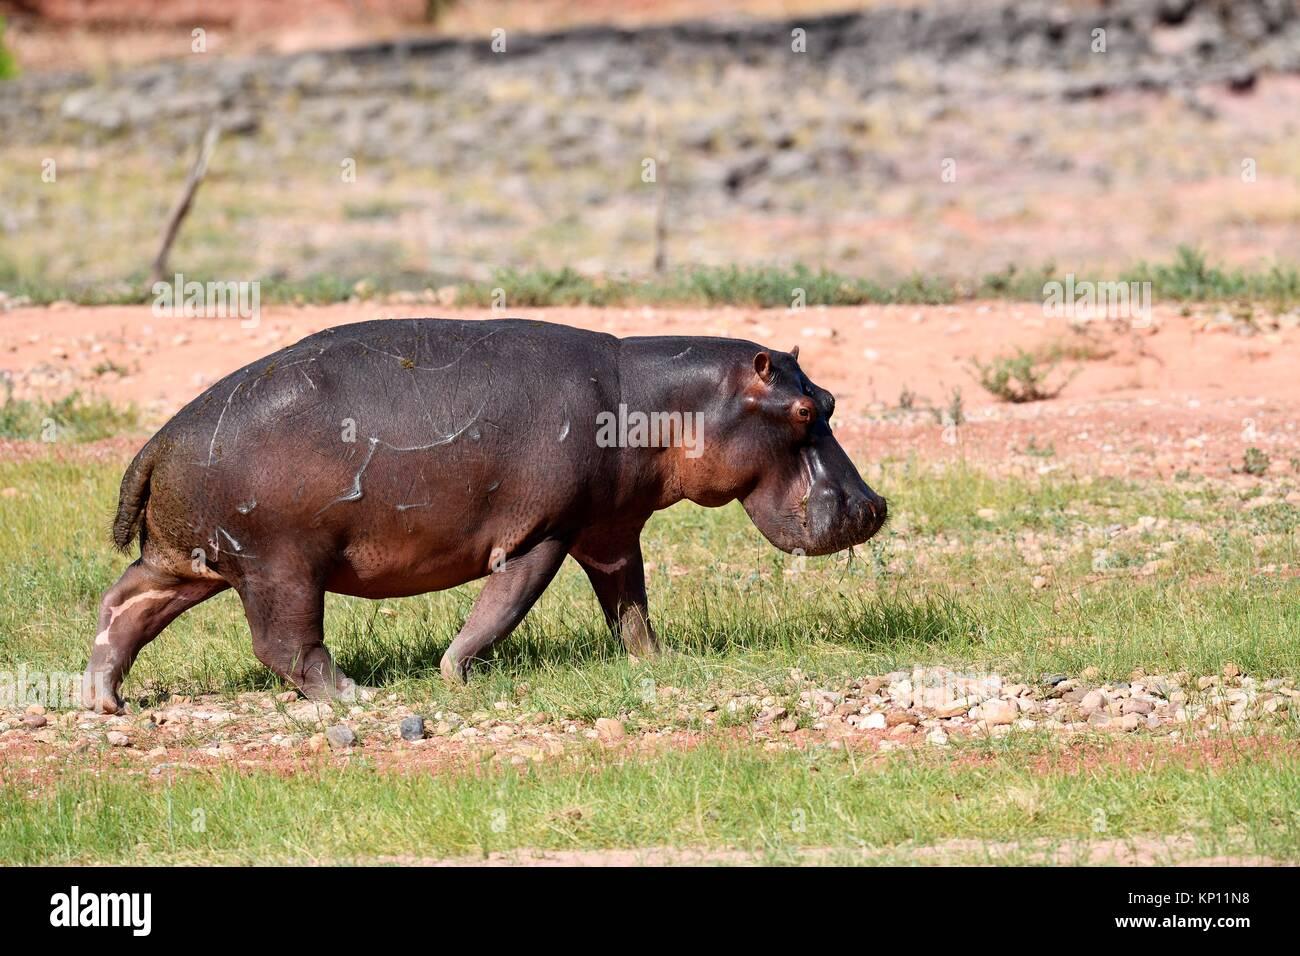 Hippopotamus (Hippopotamus) walking in Matusadona National Park, Zimbabwe. - Stock Image